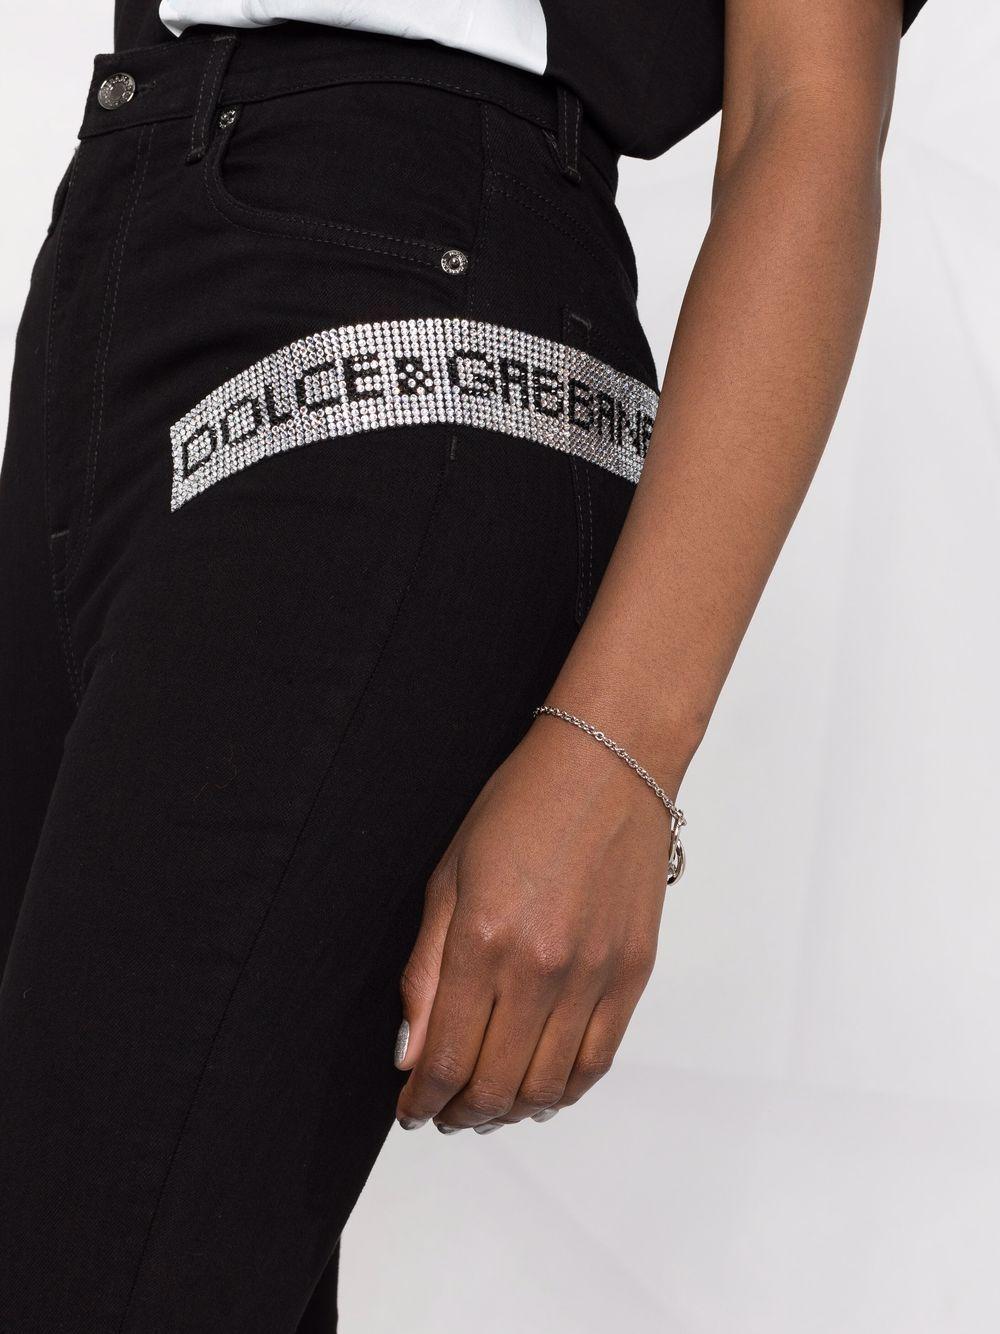 Black cotton skinny jeans from featuring high waist DOLCE & GABBANA |  | FTBXHZ-G901YS9001